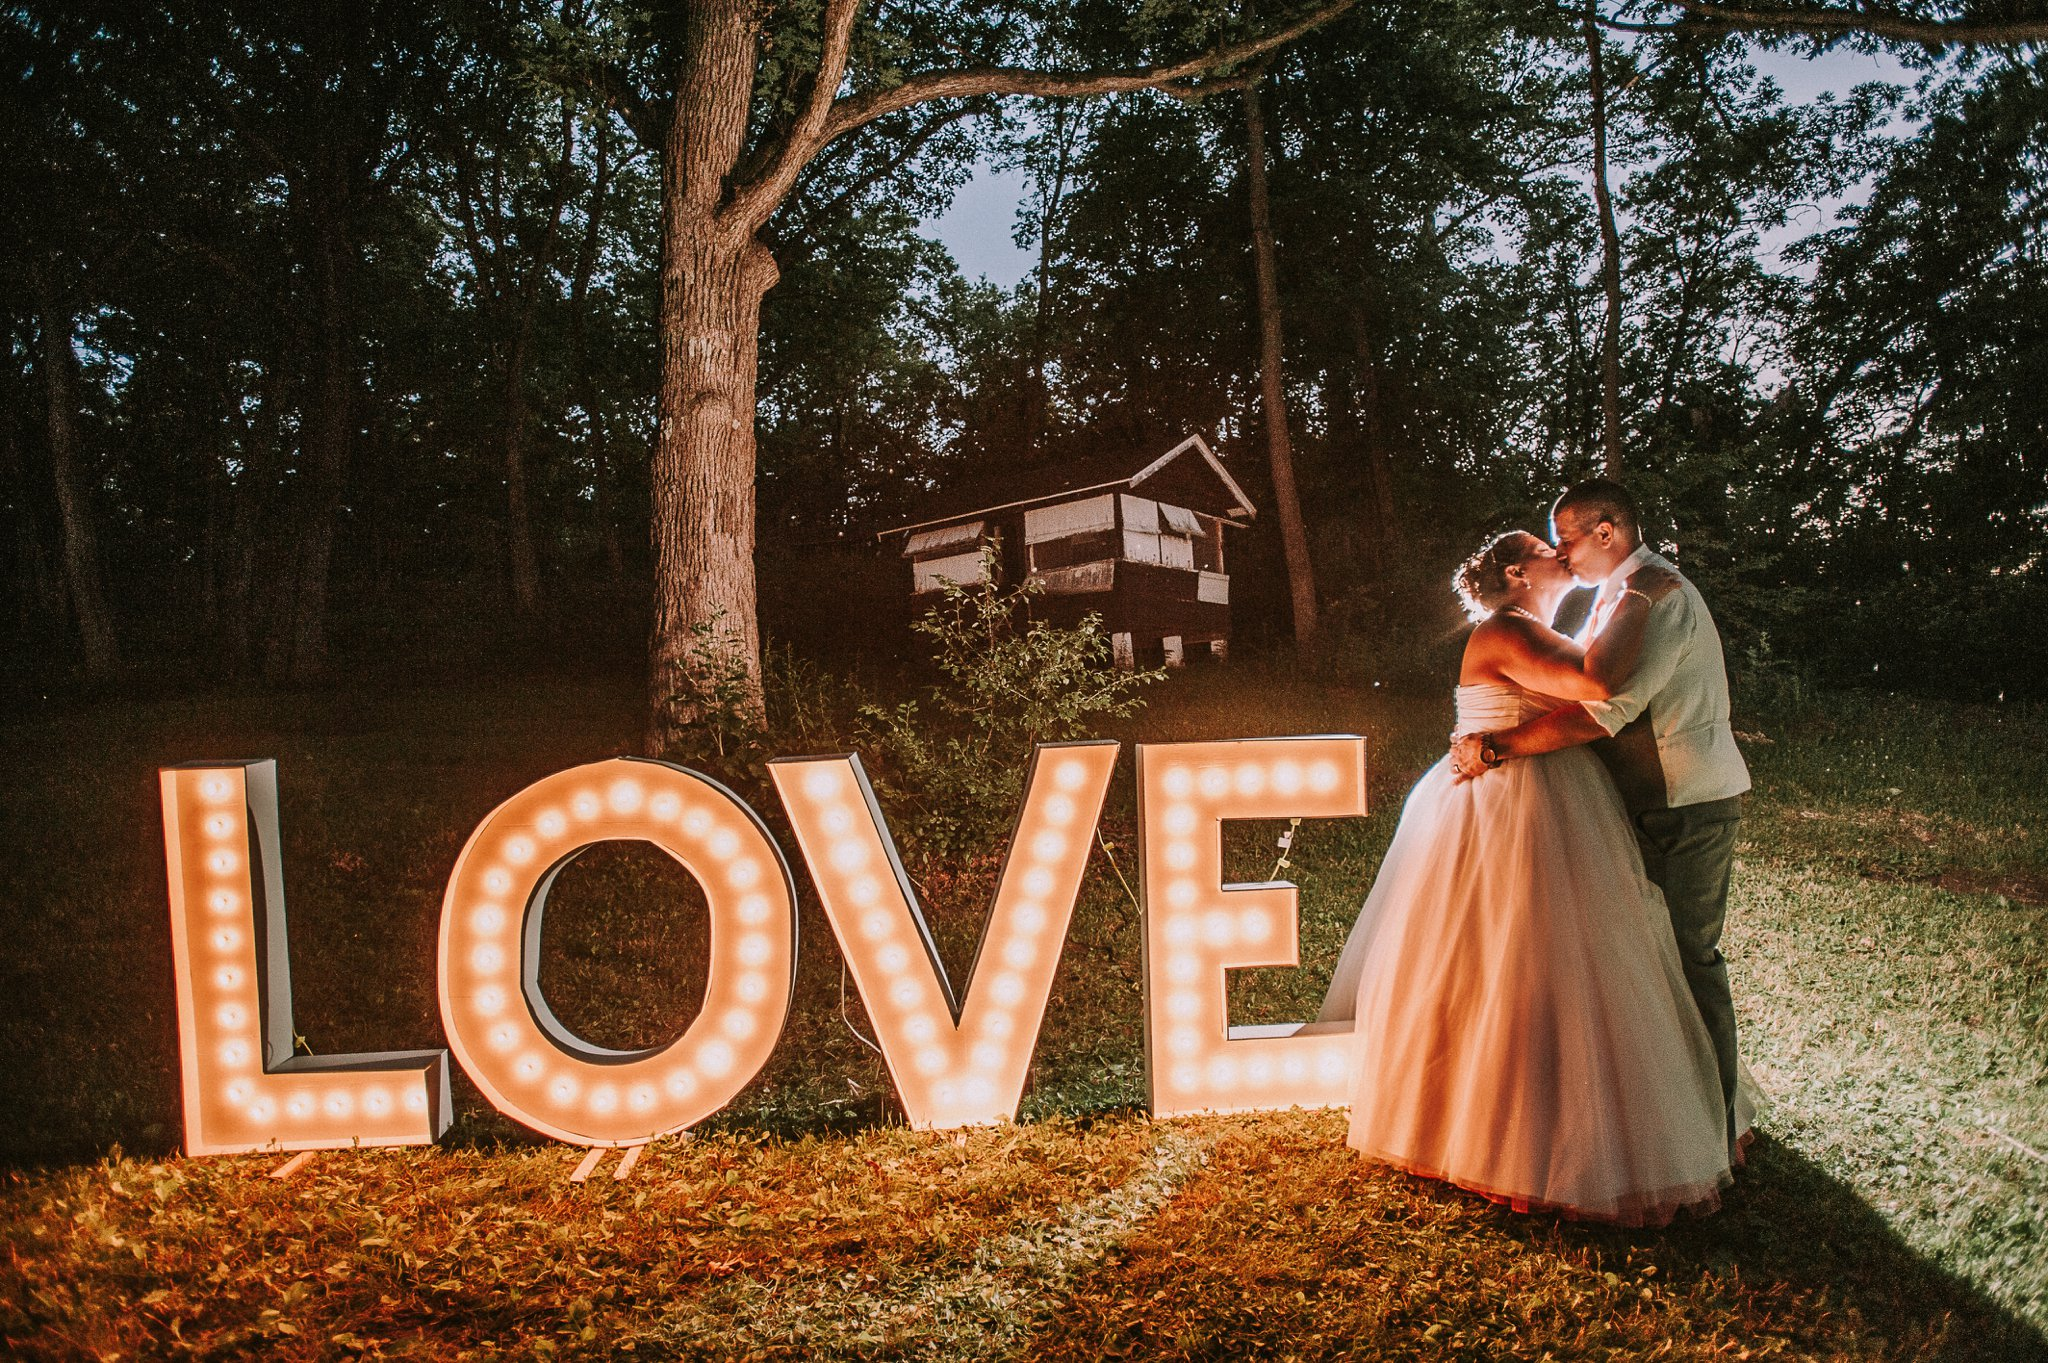 DIY wedding couple standing near their homemade sign.